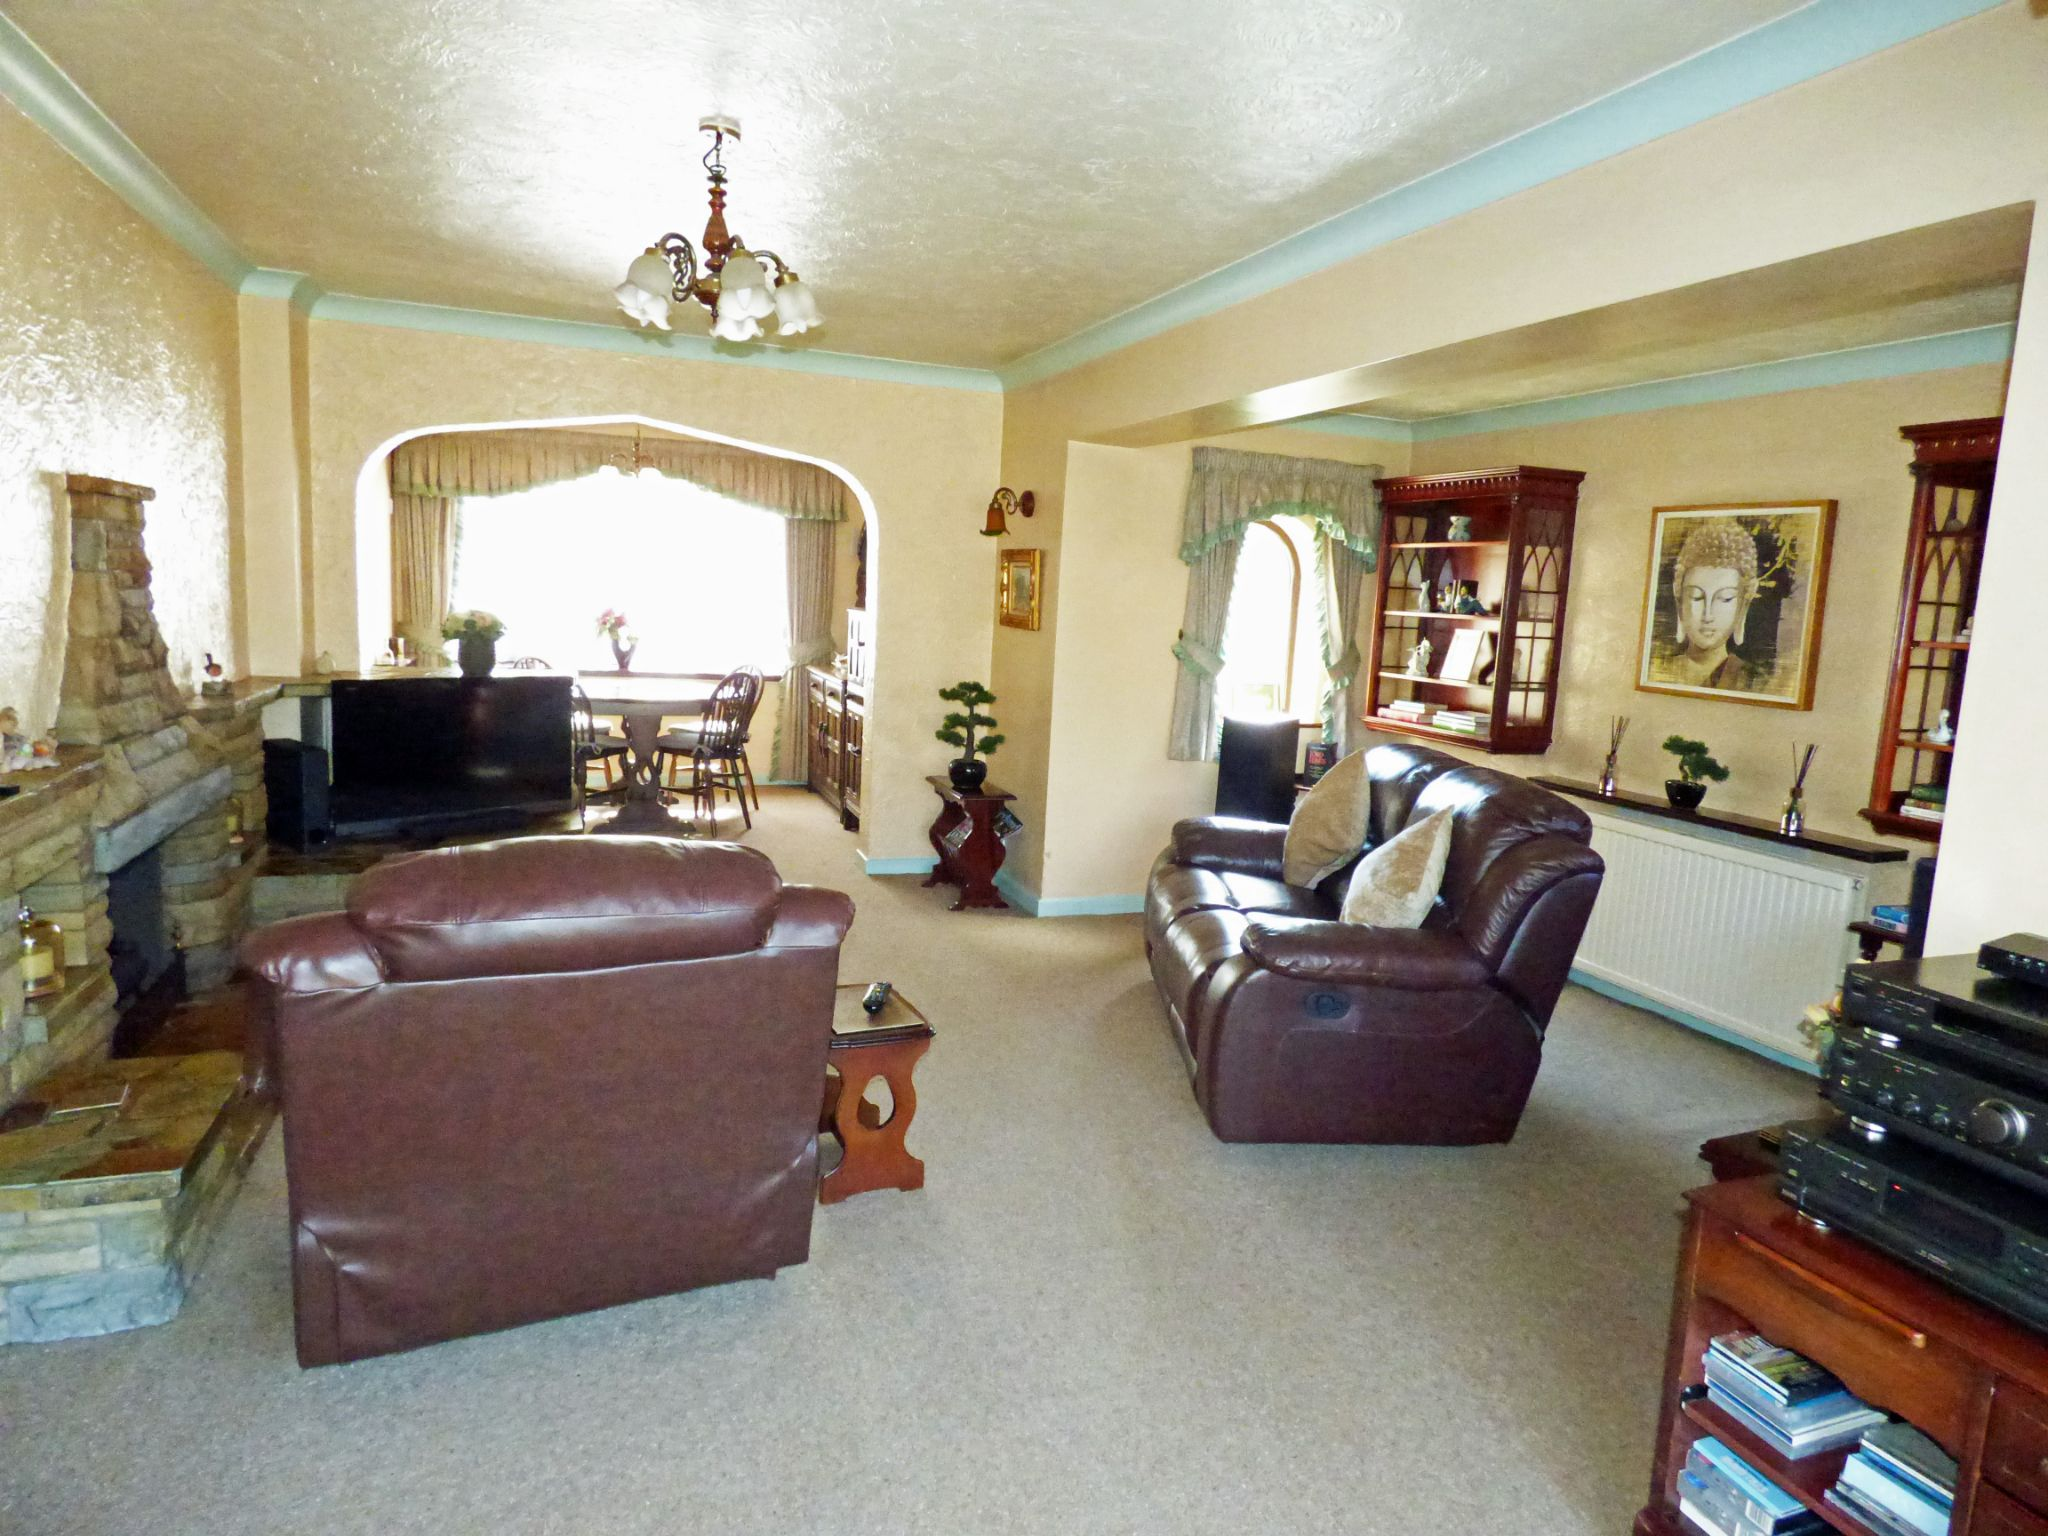 3 Bedroom Detached House For Sale - Lounge 2